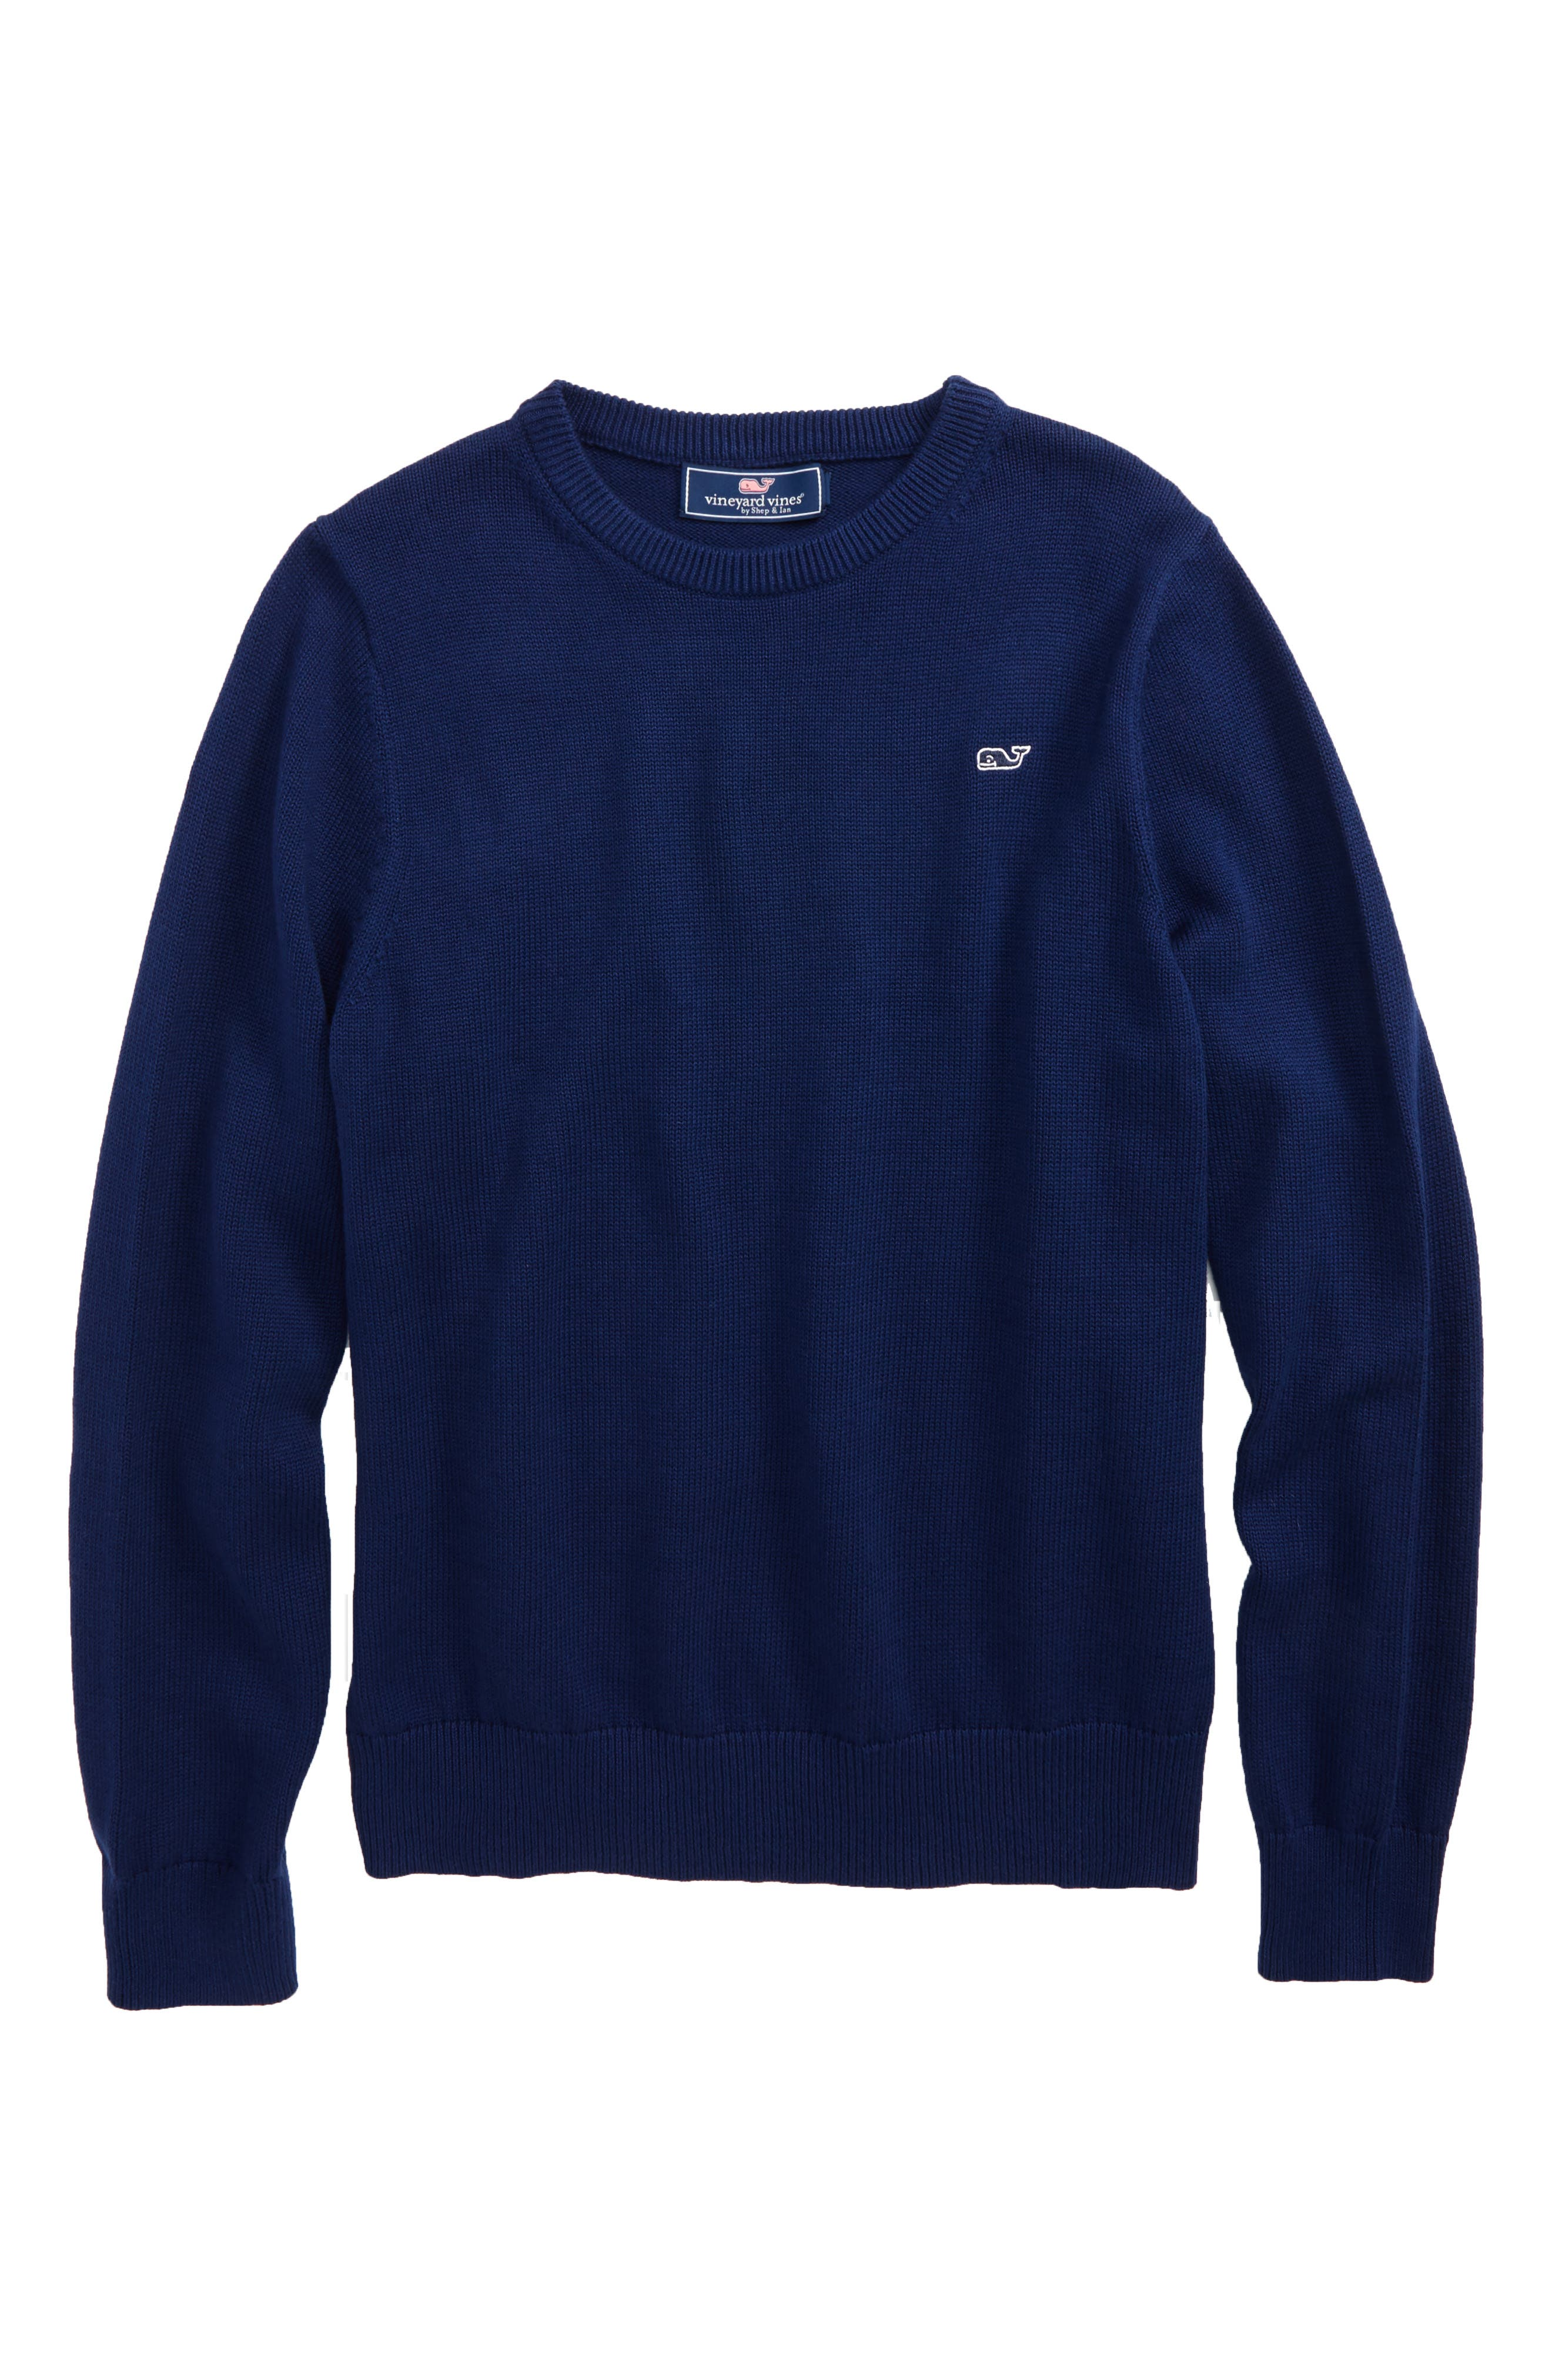 Classic Crewneck Sweater,                             Main thumbnail 1, color,